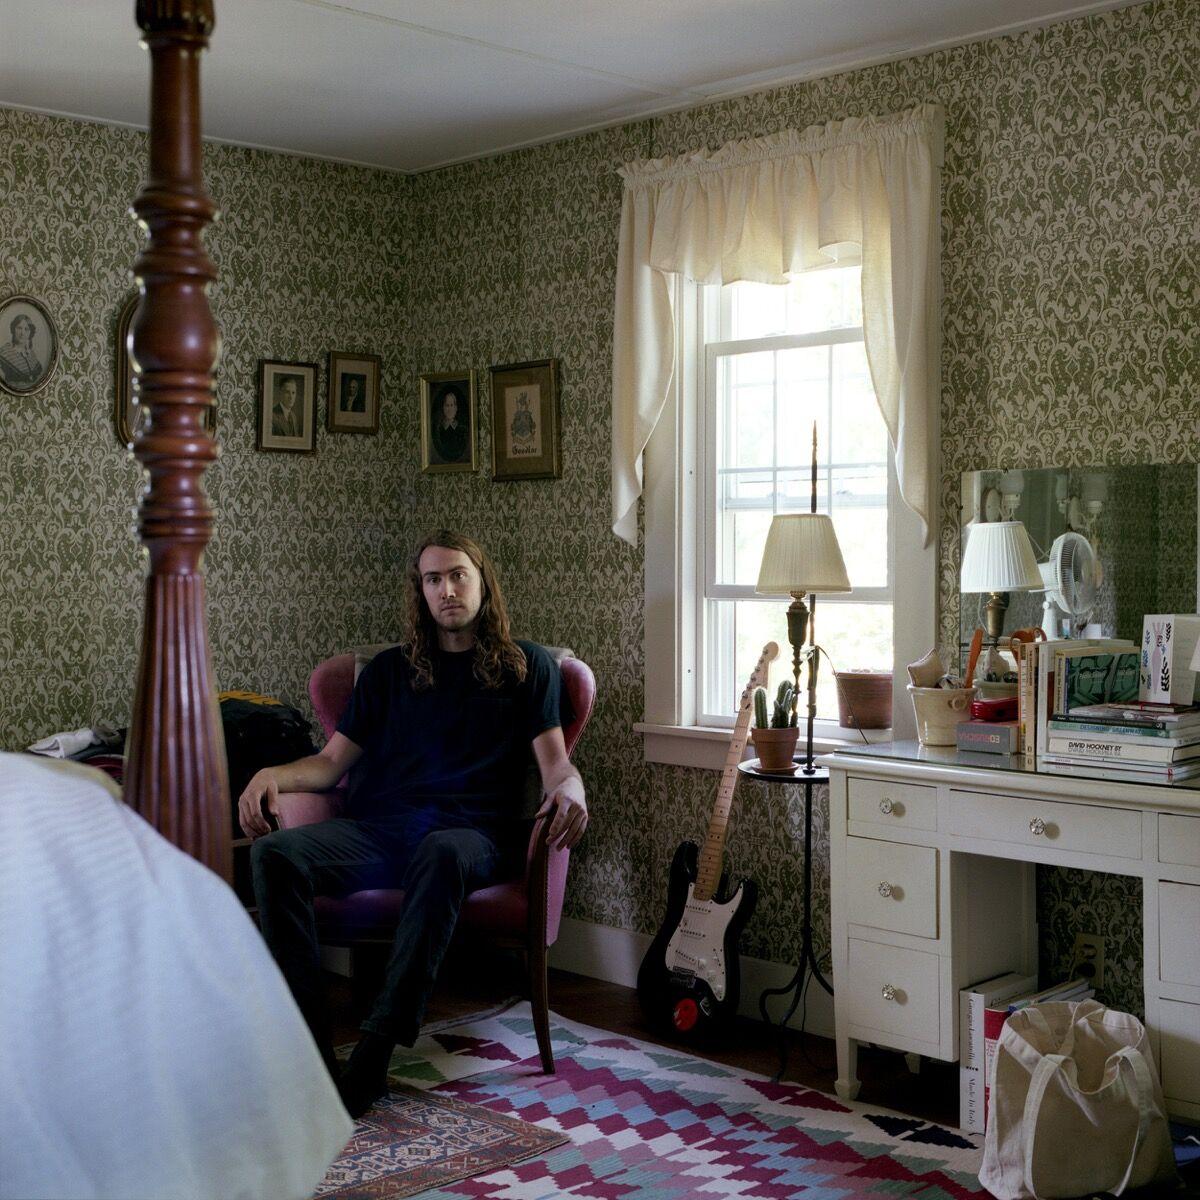 Tanja Hollander, James Pettengill, Hinsdale, New Hampshire, 2014. Courtesy of Tanja Hollander and MASS MoCA.